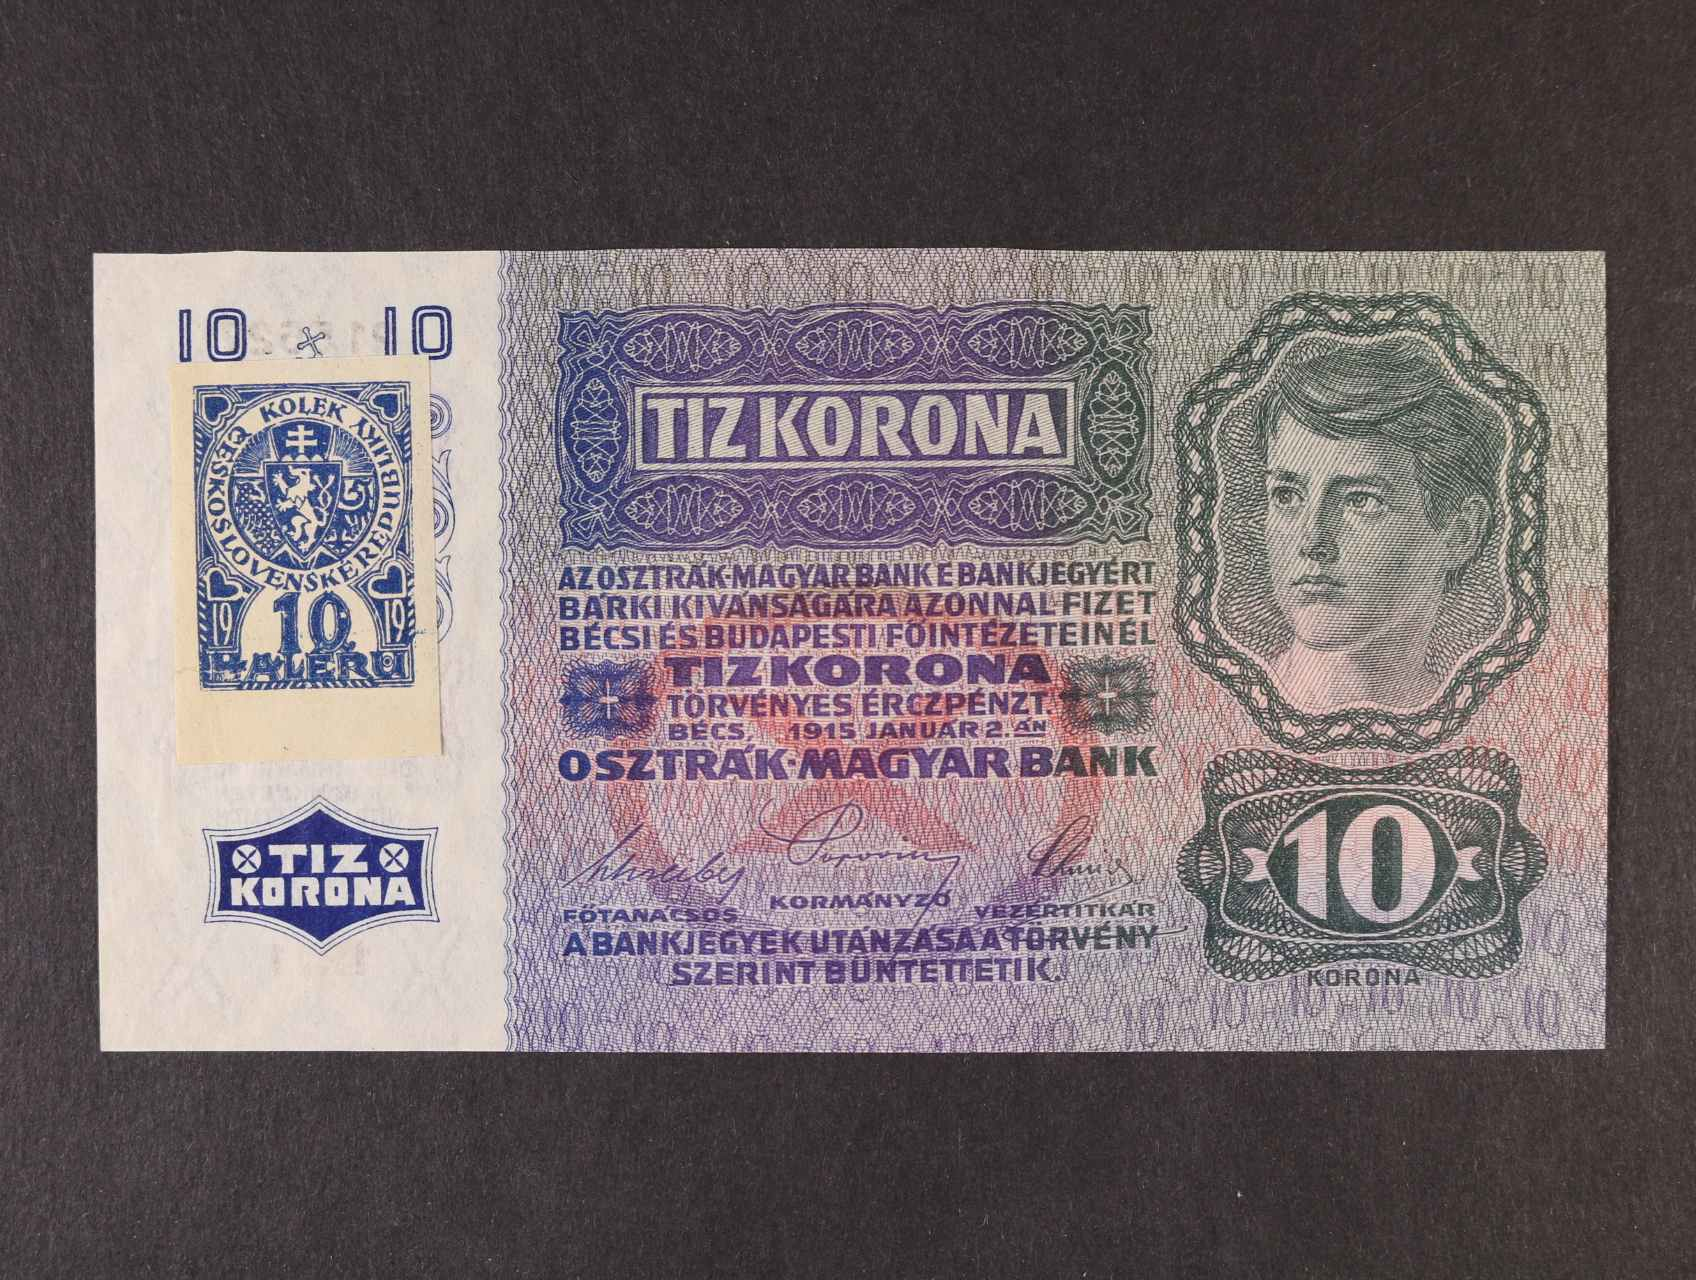 10 K 2.1.1915 kolkovaná série 1211, Ba. 1a, Pi. 1